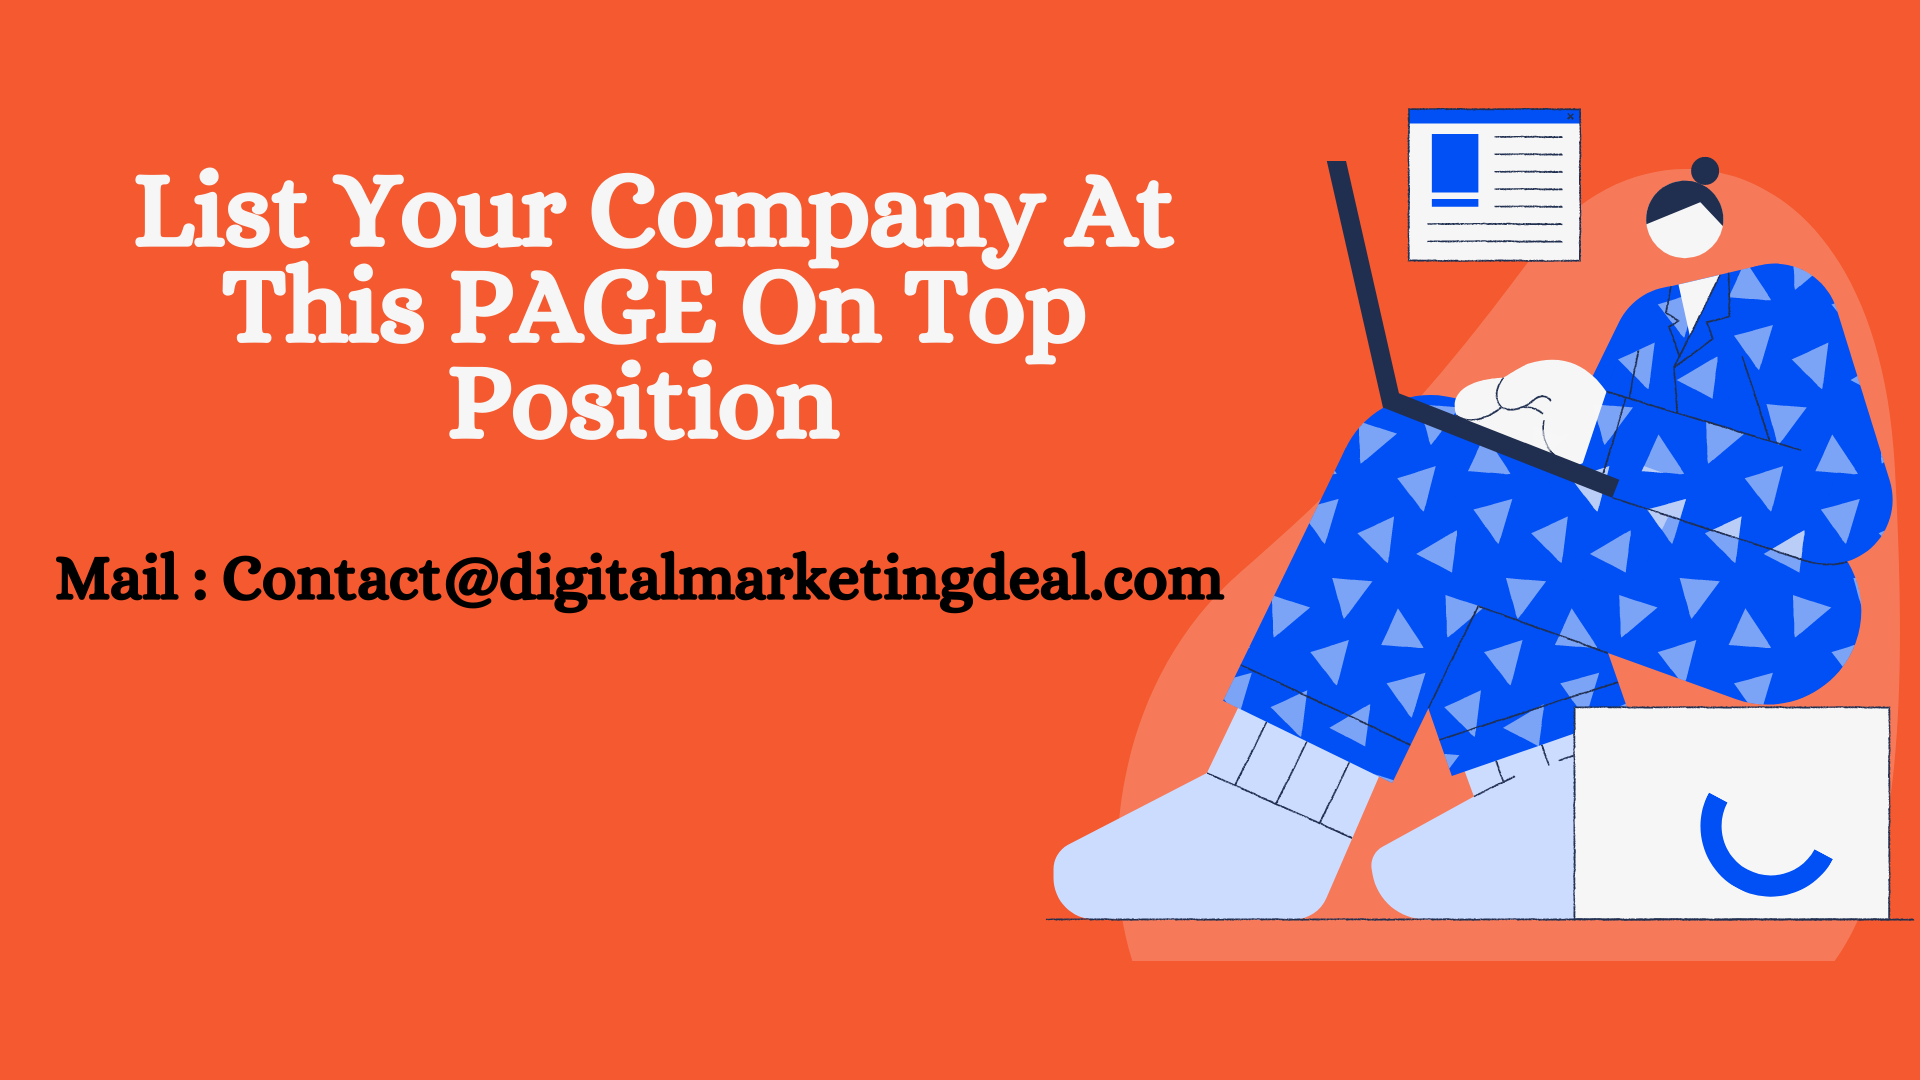 Top Digital Marketing Companies in Hyderabad List 2021 Updated